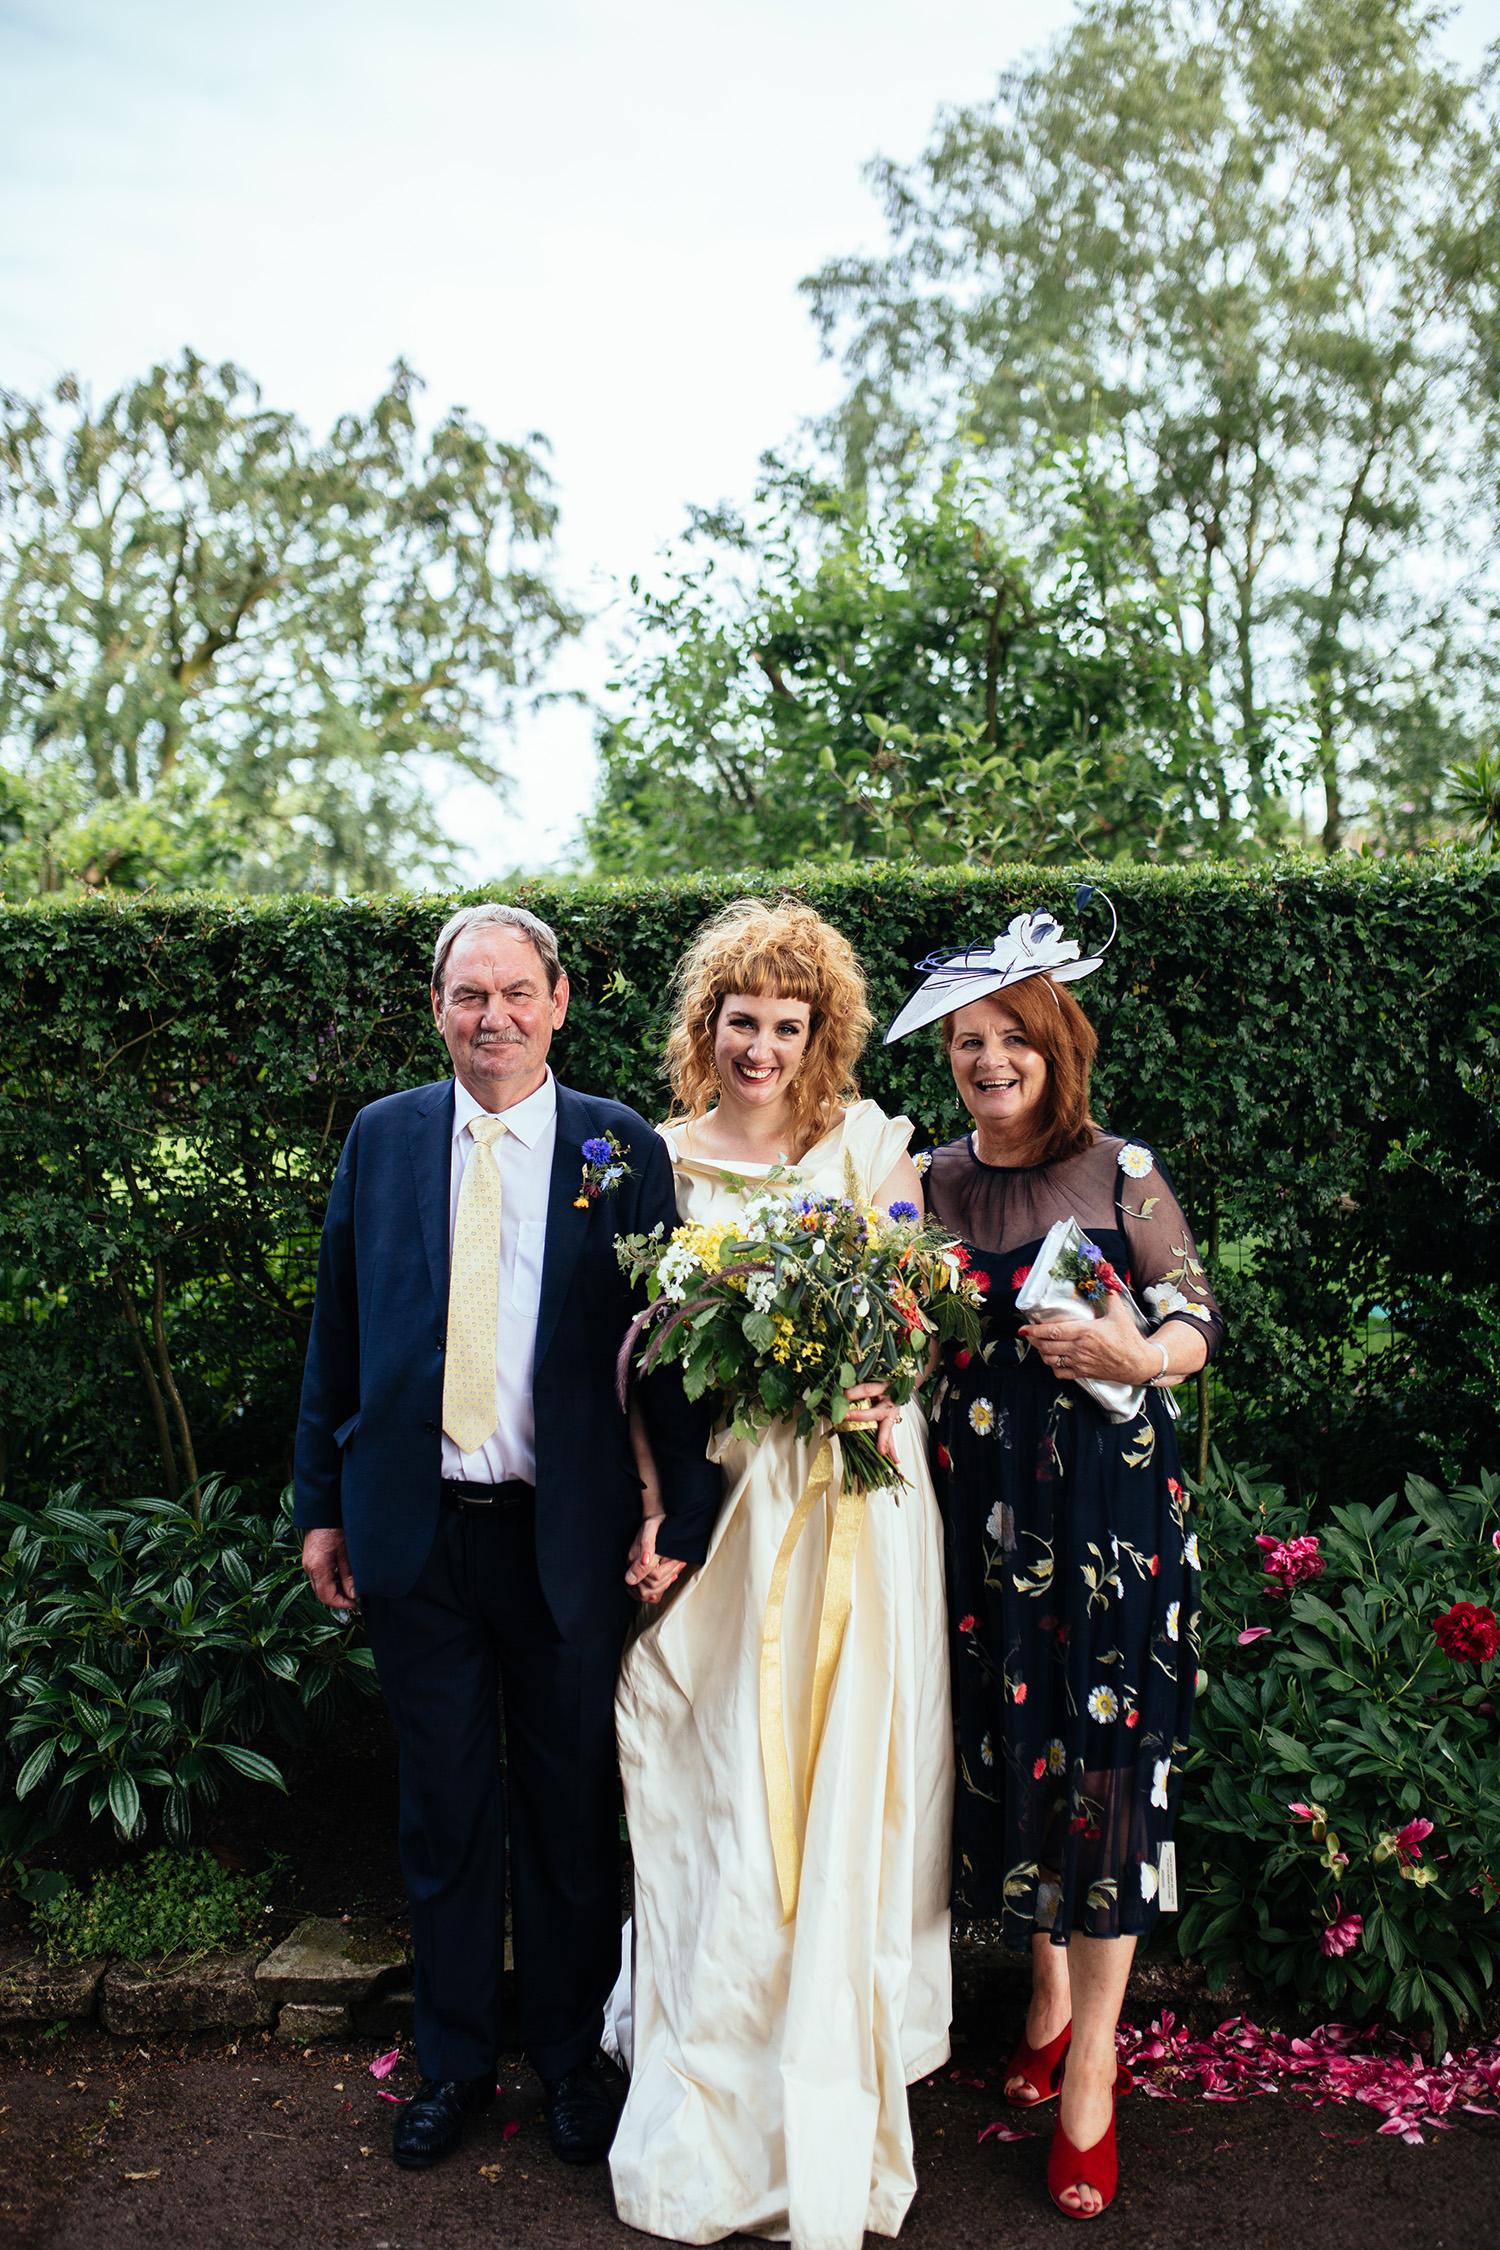 Manchester Wes Anderson Village Hall Wedding 131.jpg